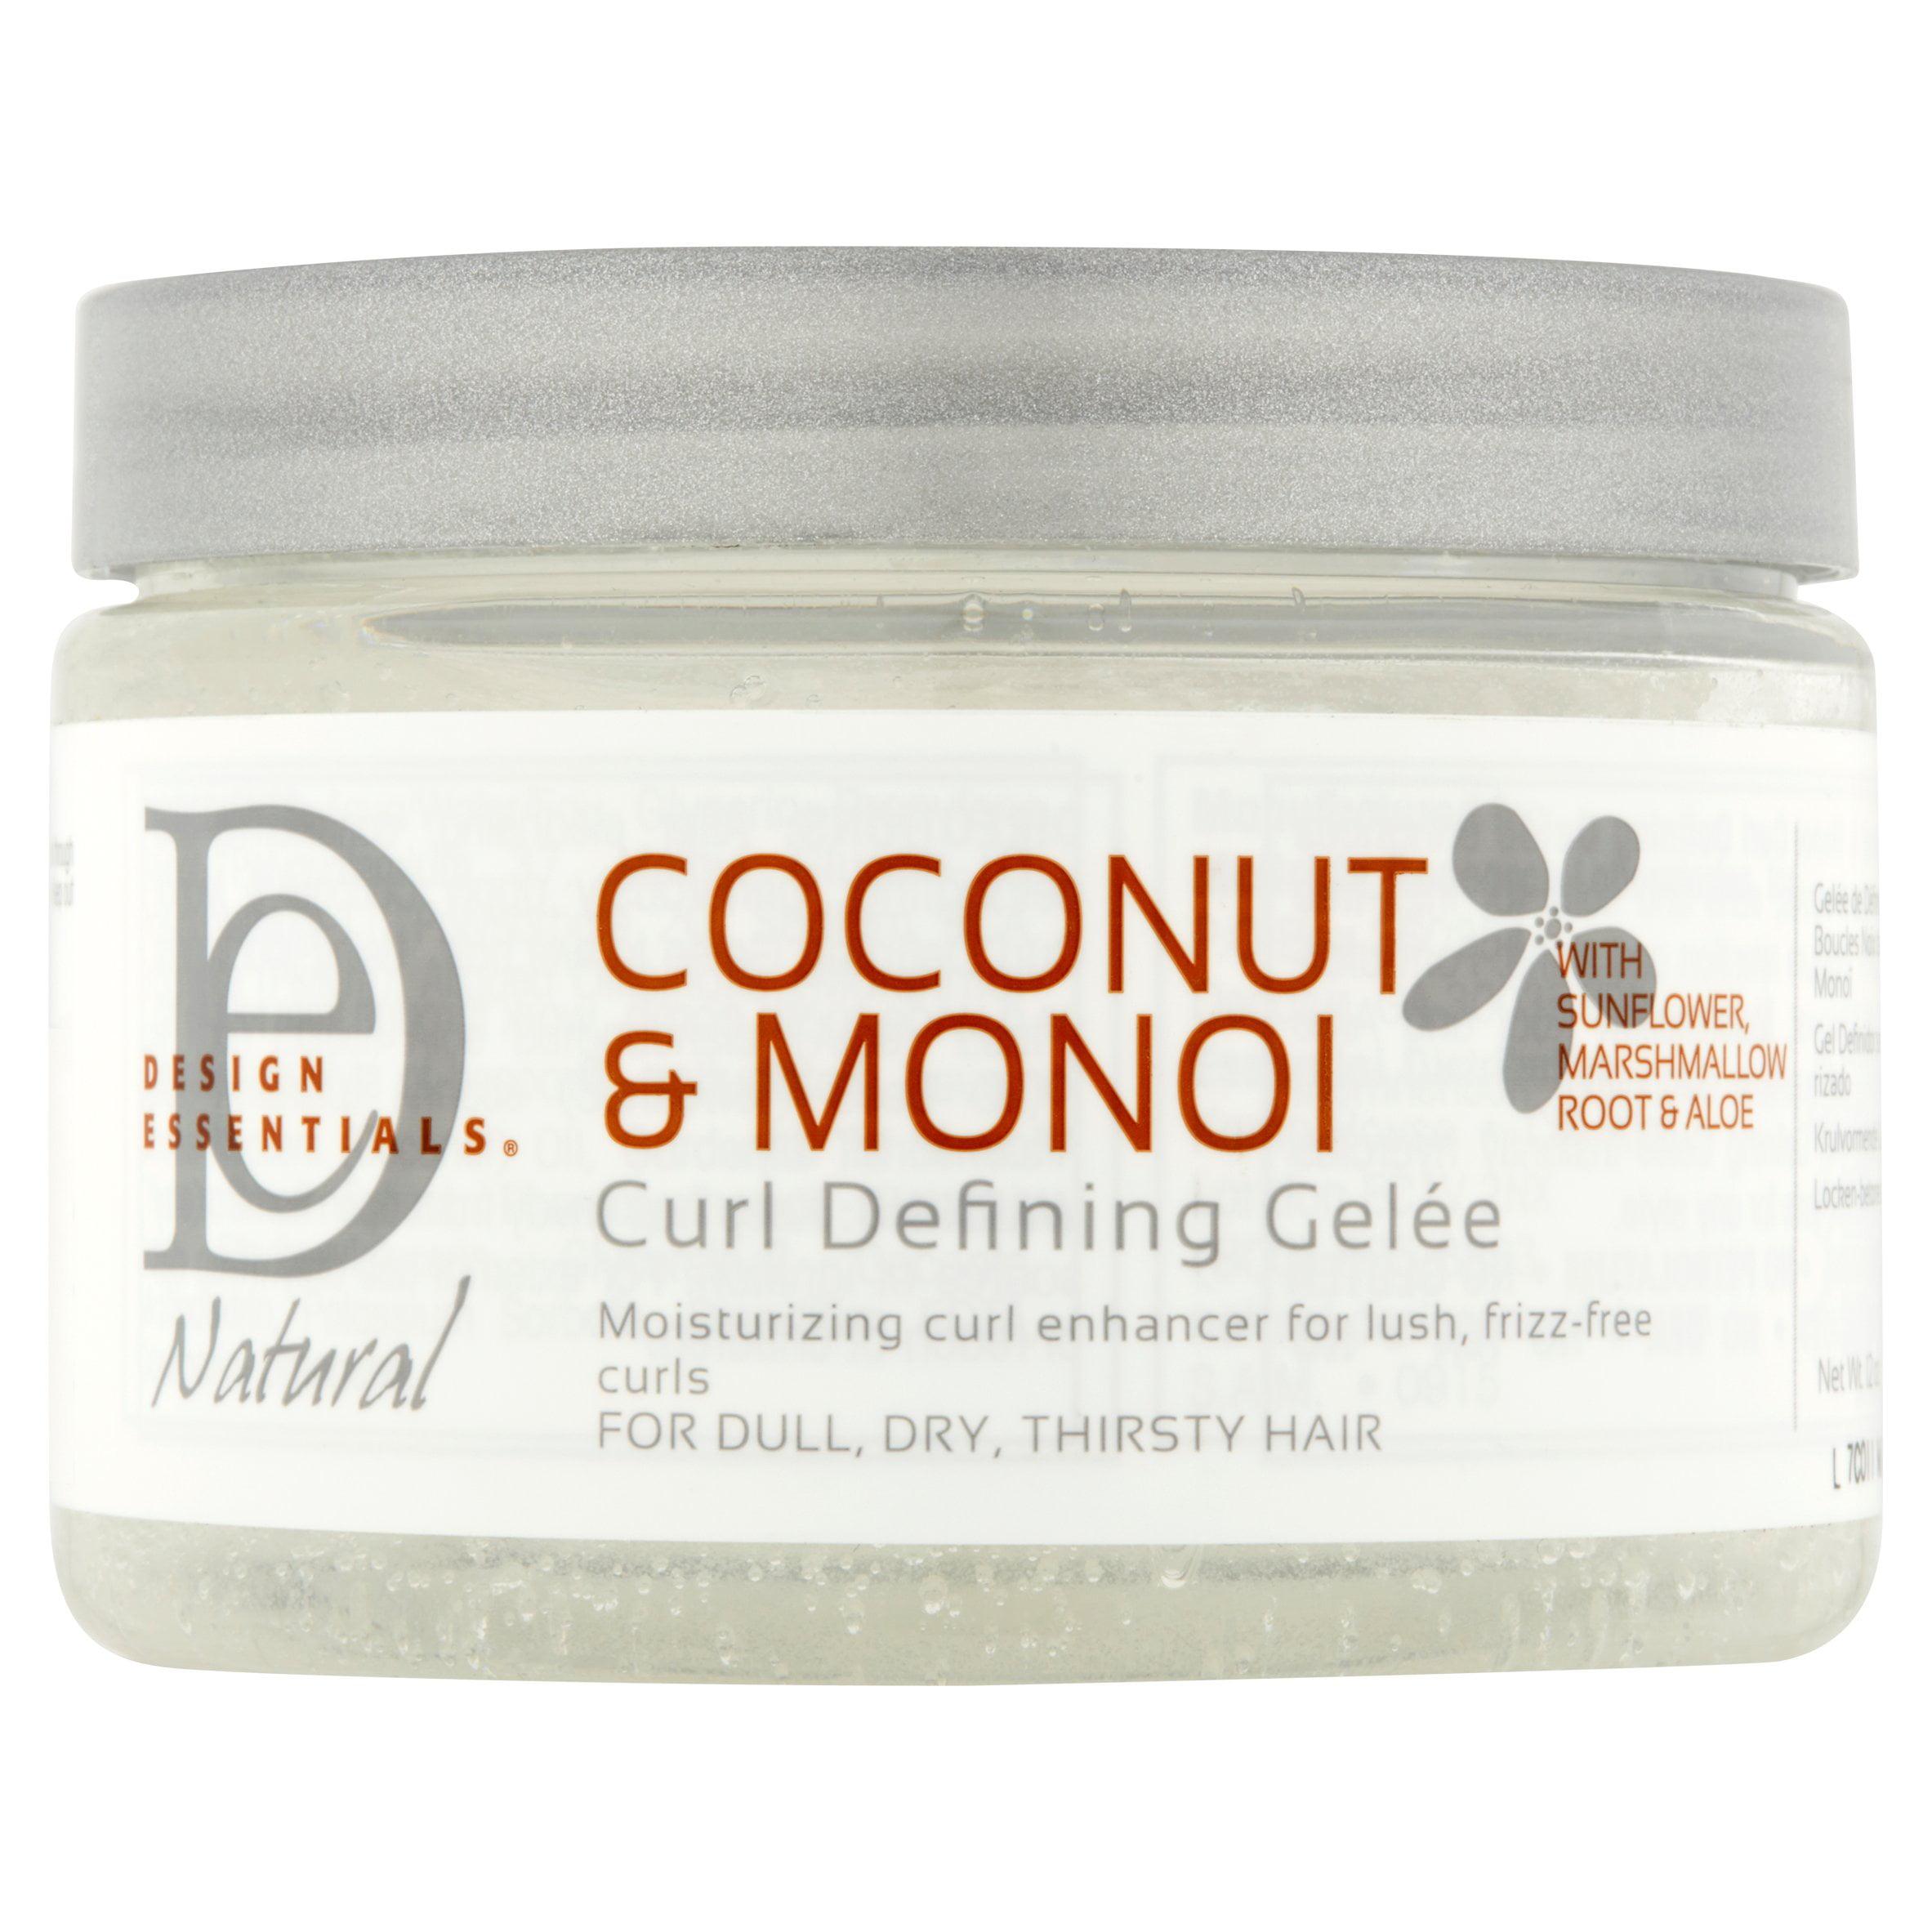 Design Essentials Natural Coconut Monoi Curl Defining Gelée 12 Oz